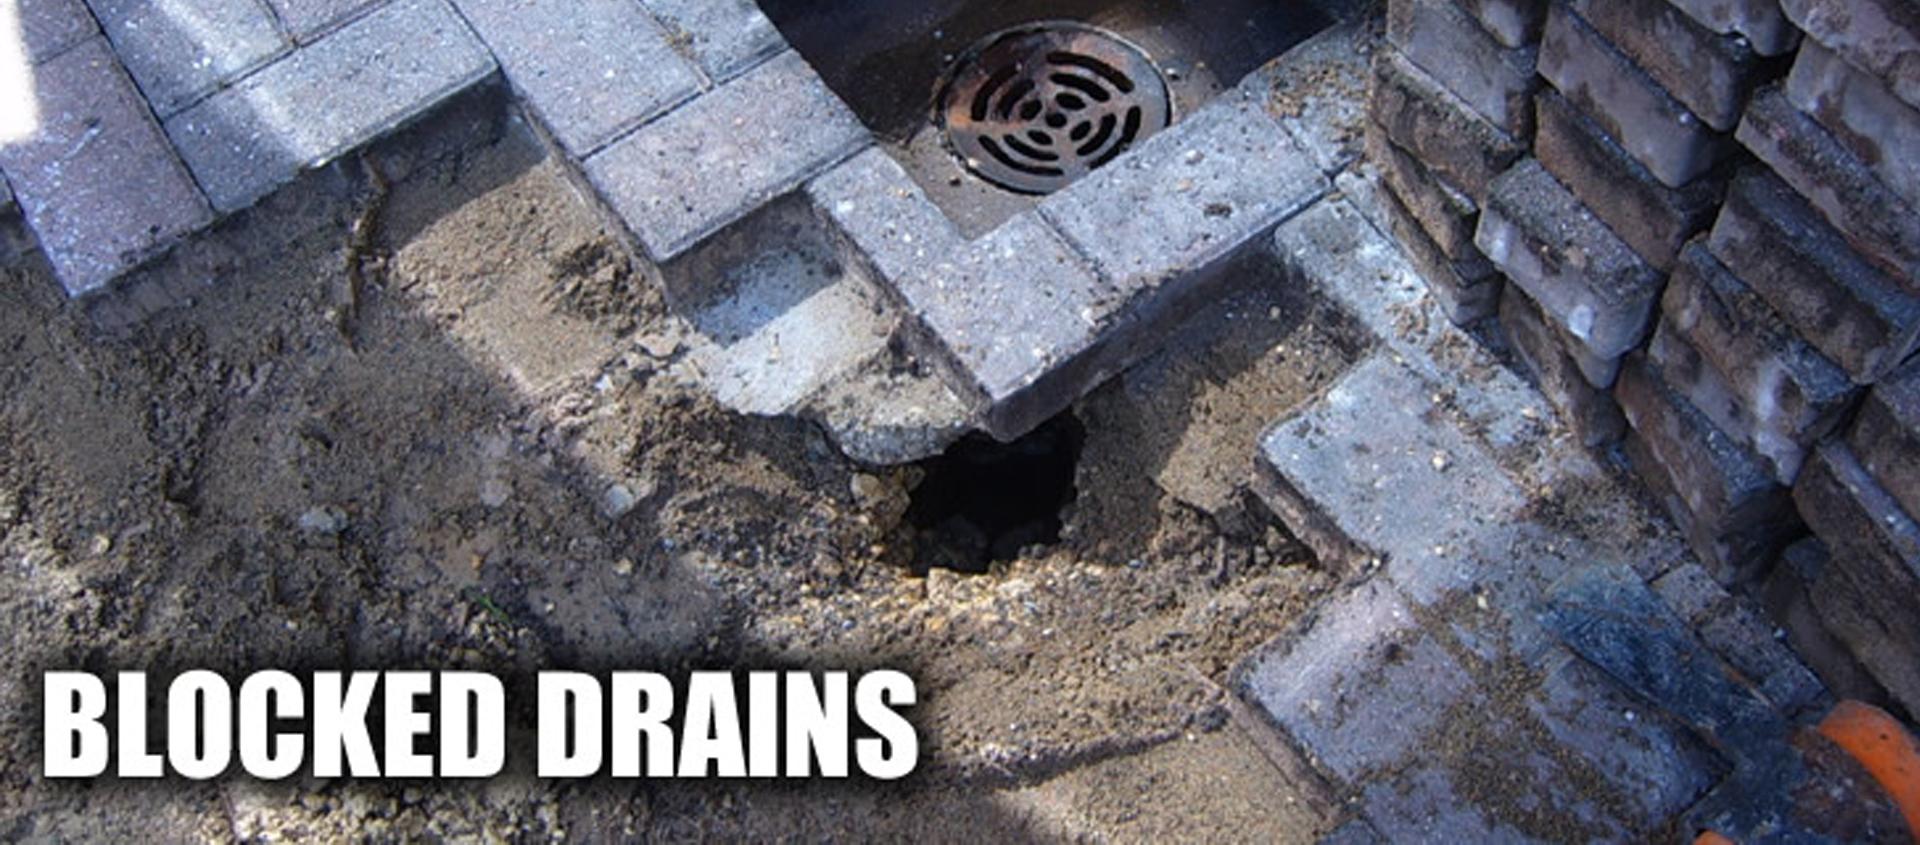 http://drainageservicesteesside.co.uk/wp-content/uploads/2019/01/image-6.jpg